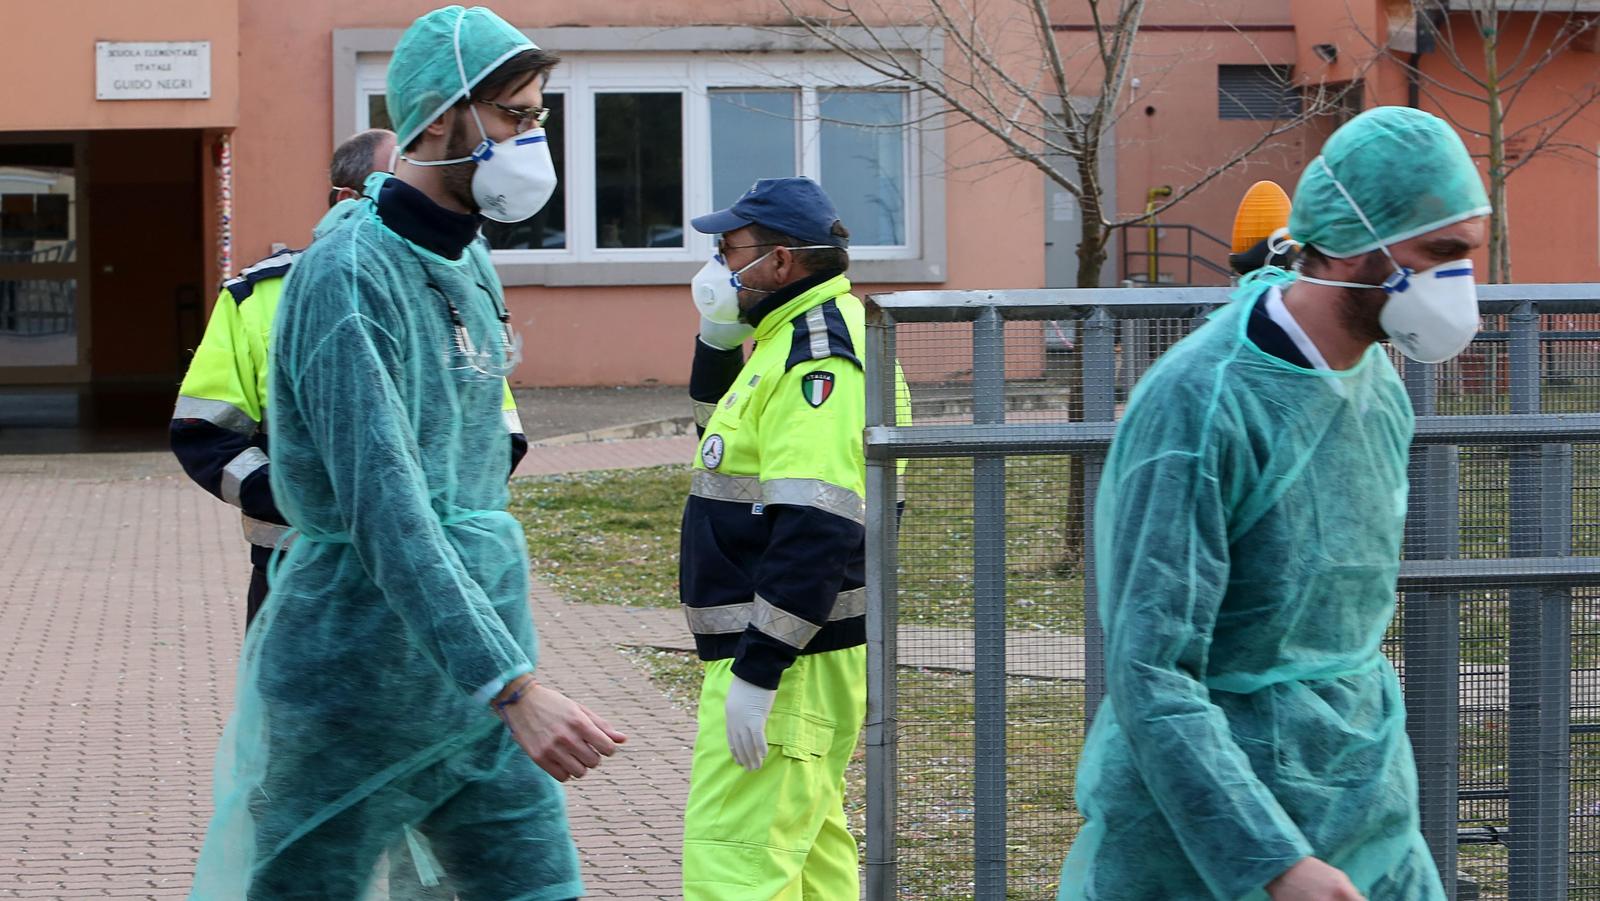 Coronavirus death toll in northern Italy rises to 11